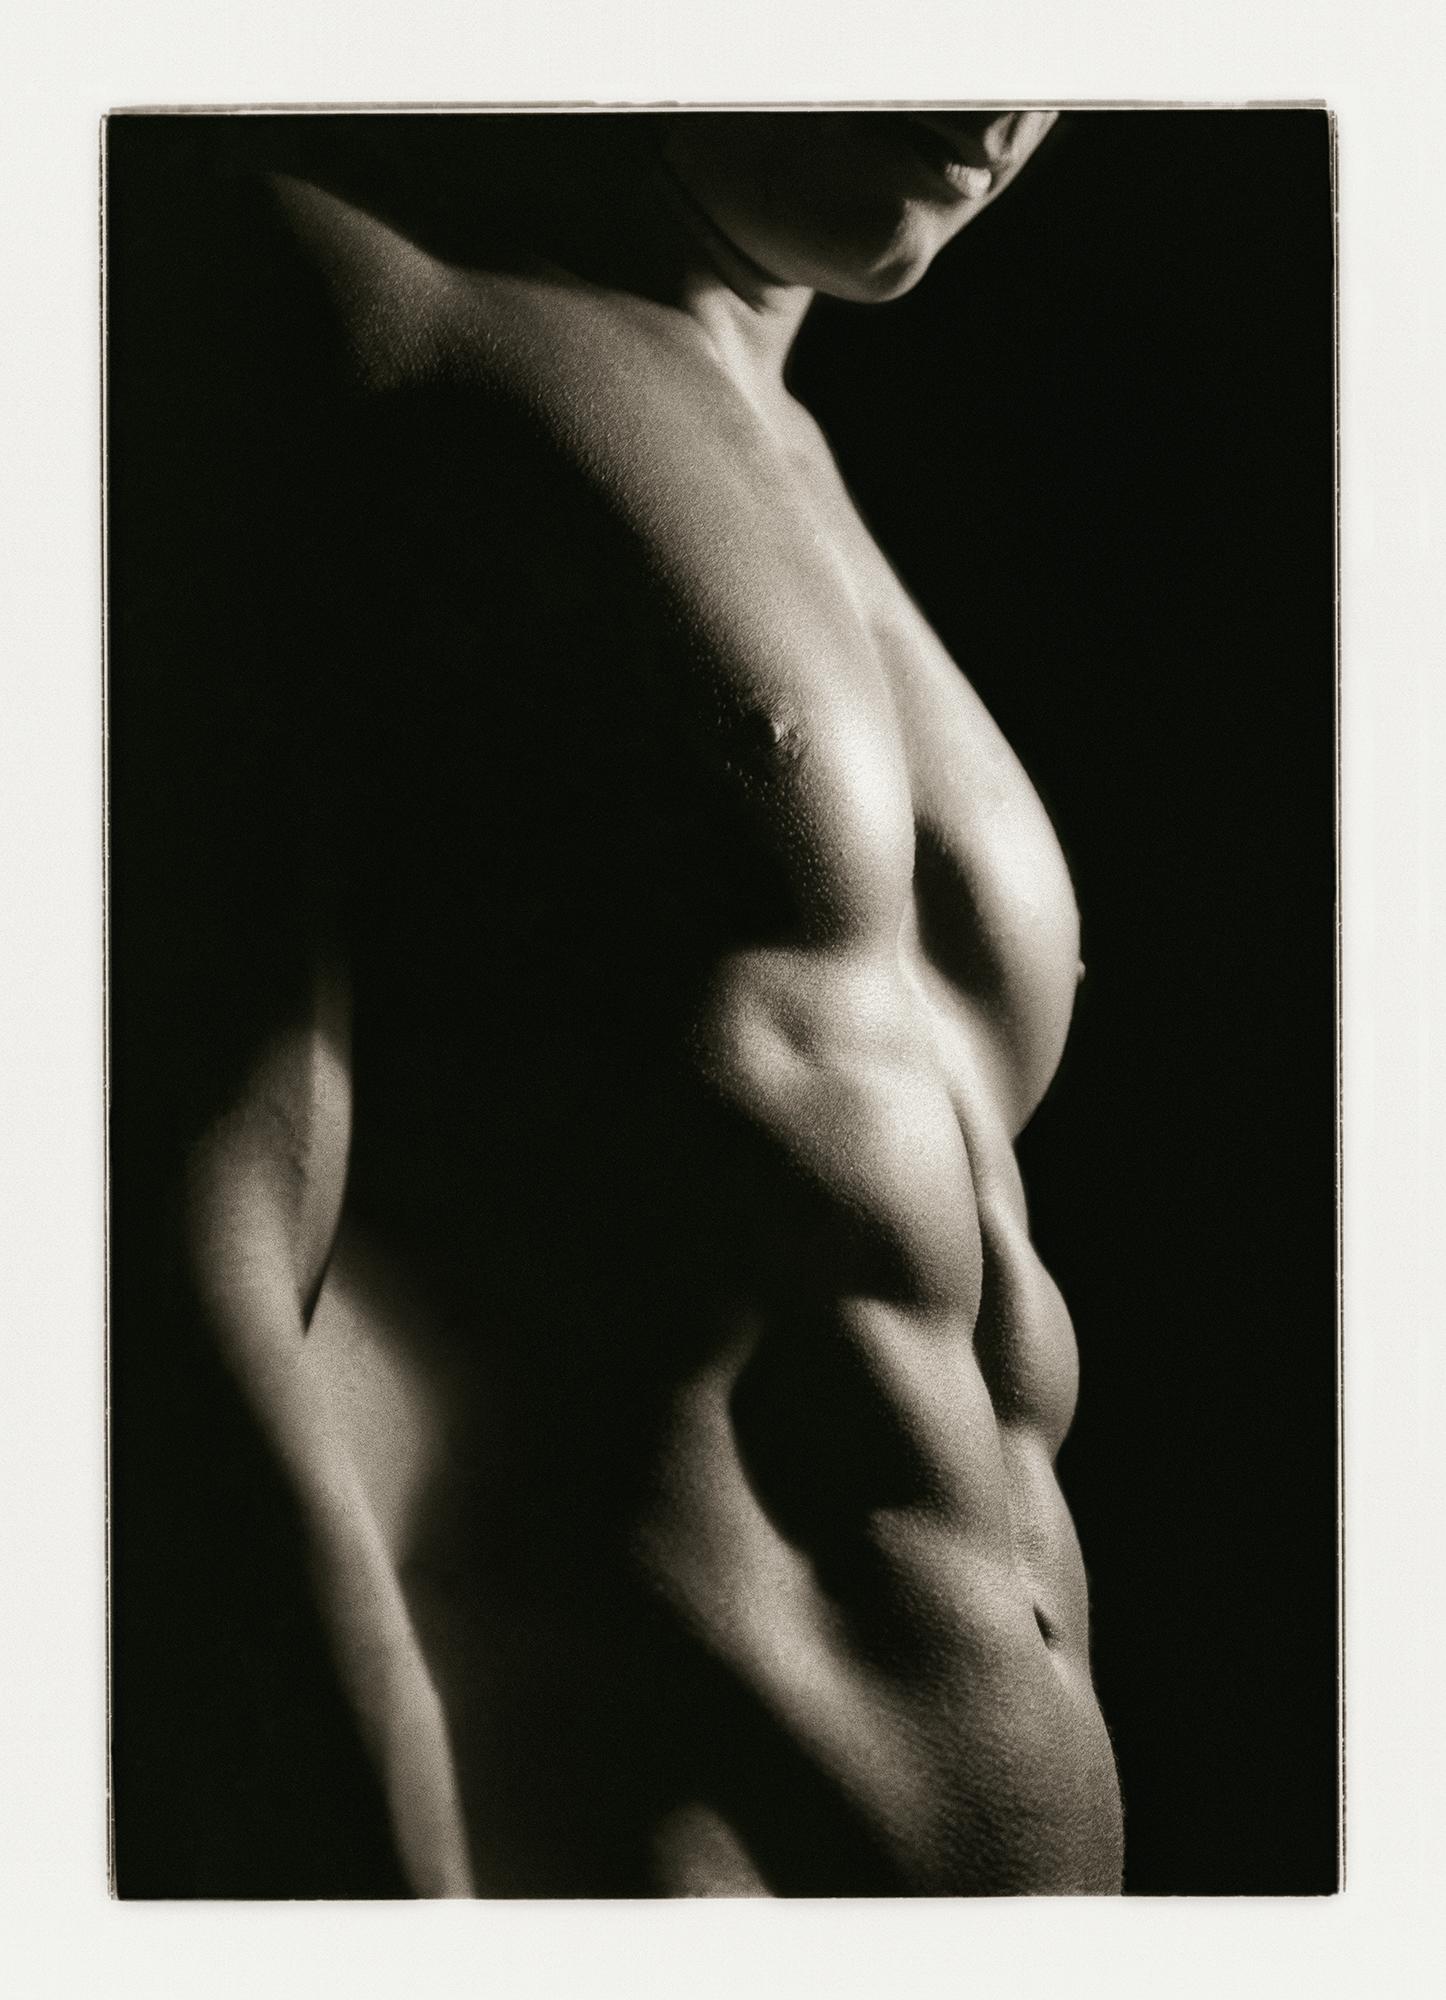 BODY #2